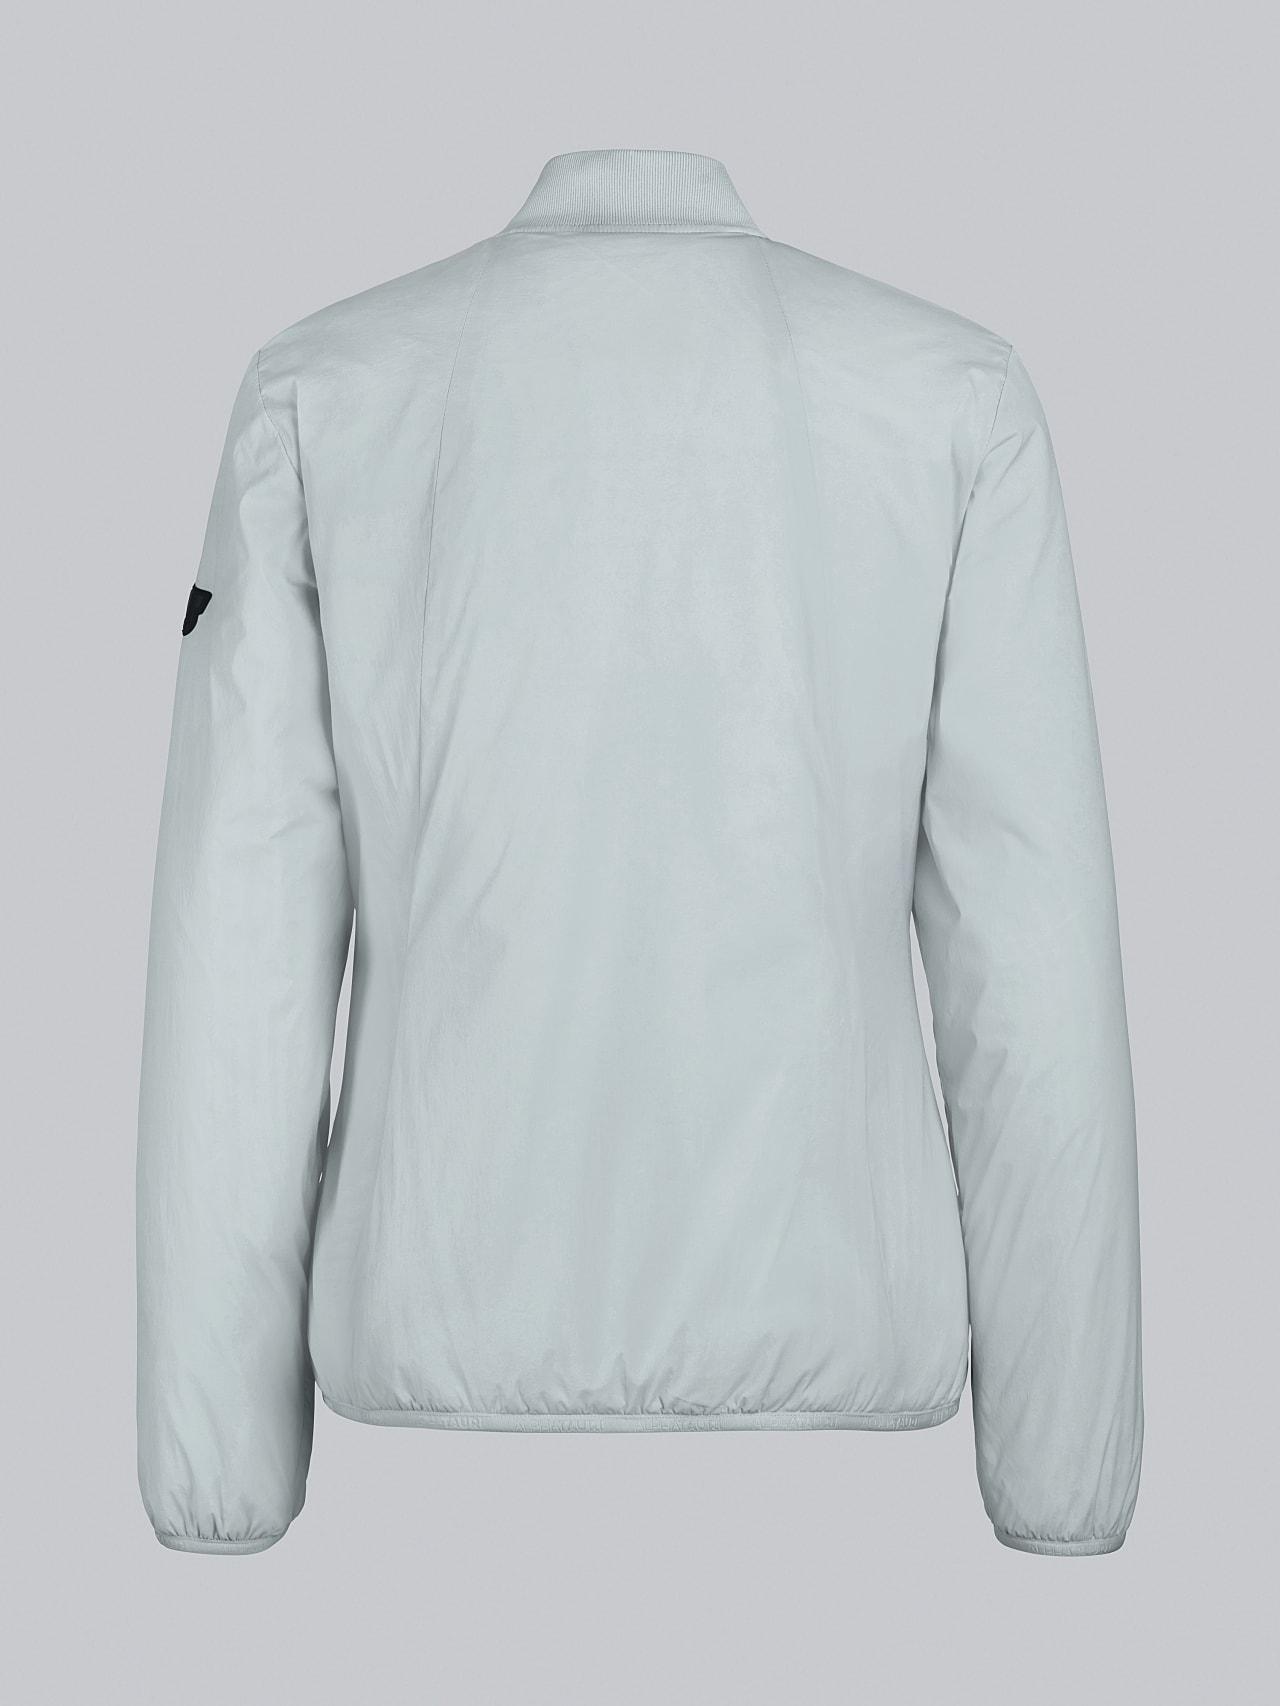 OVAS V4.Y5.02 Padded PrimaLoft® Jacket Pale Blue  Left Alpha Tauri